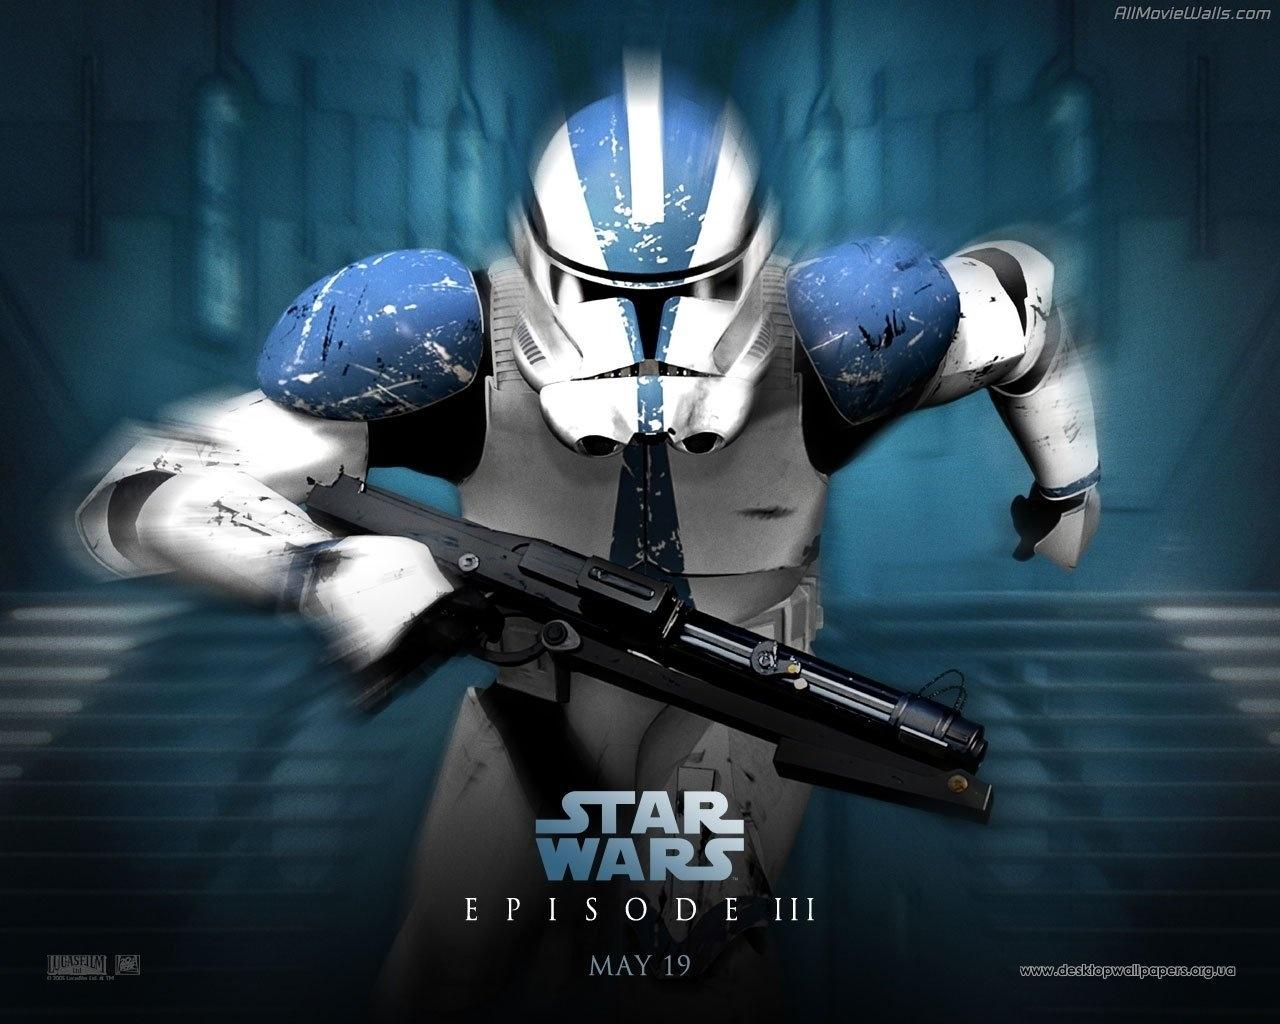 episode iii kino zvezdnye vojny star wars 889 - Детский день рождения